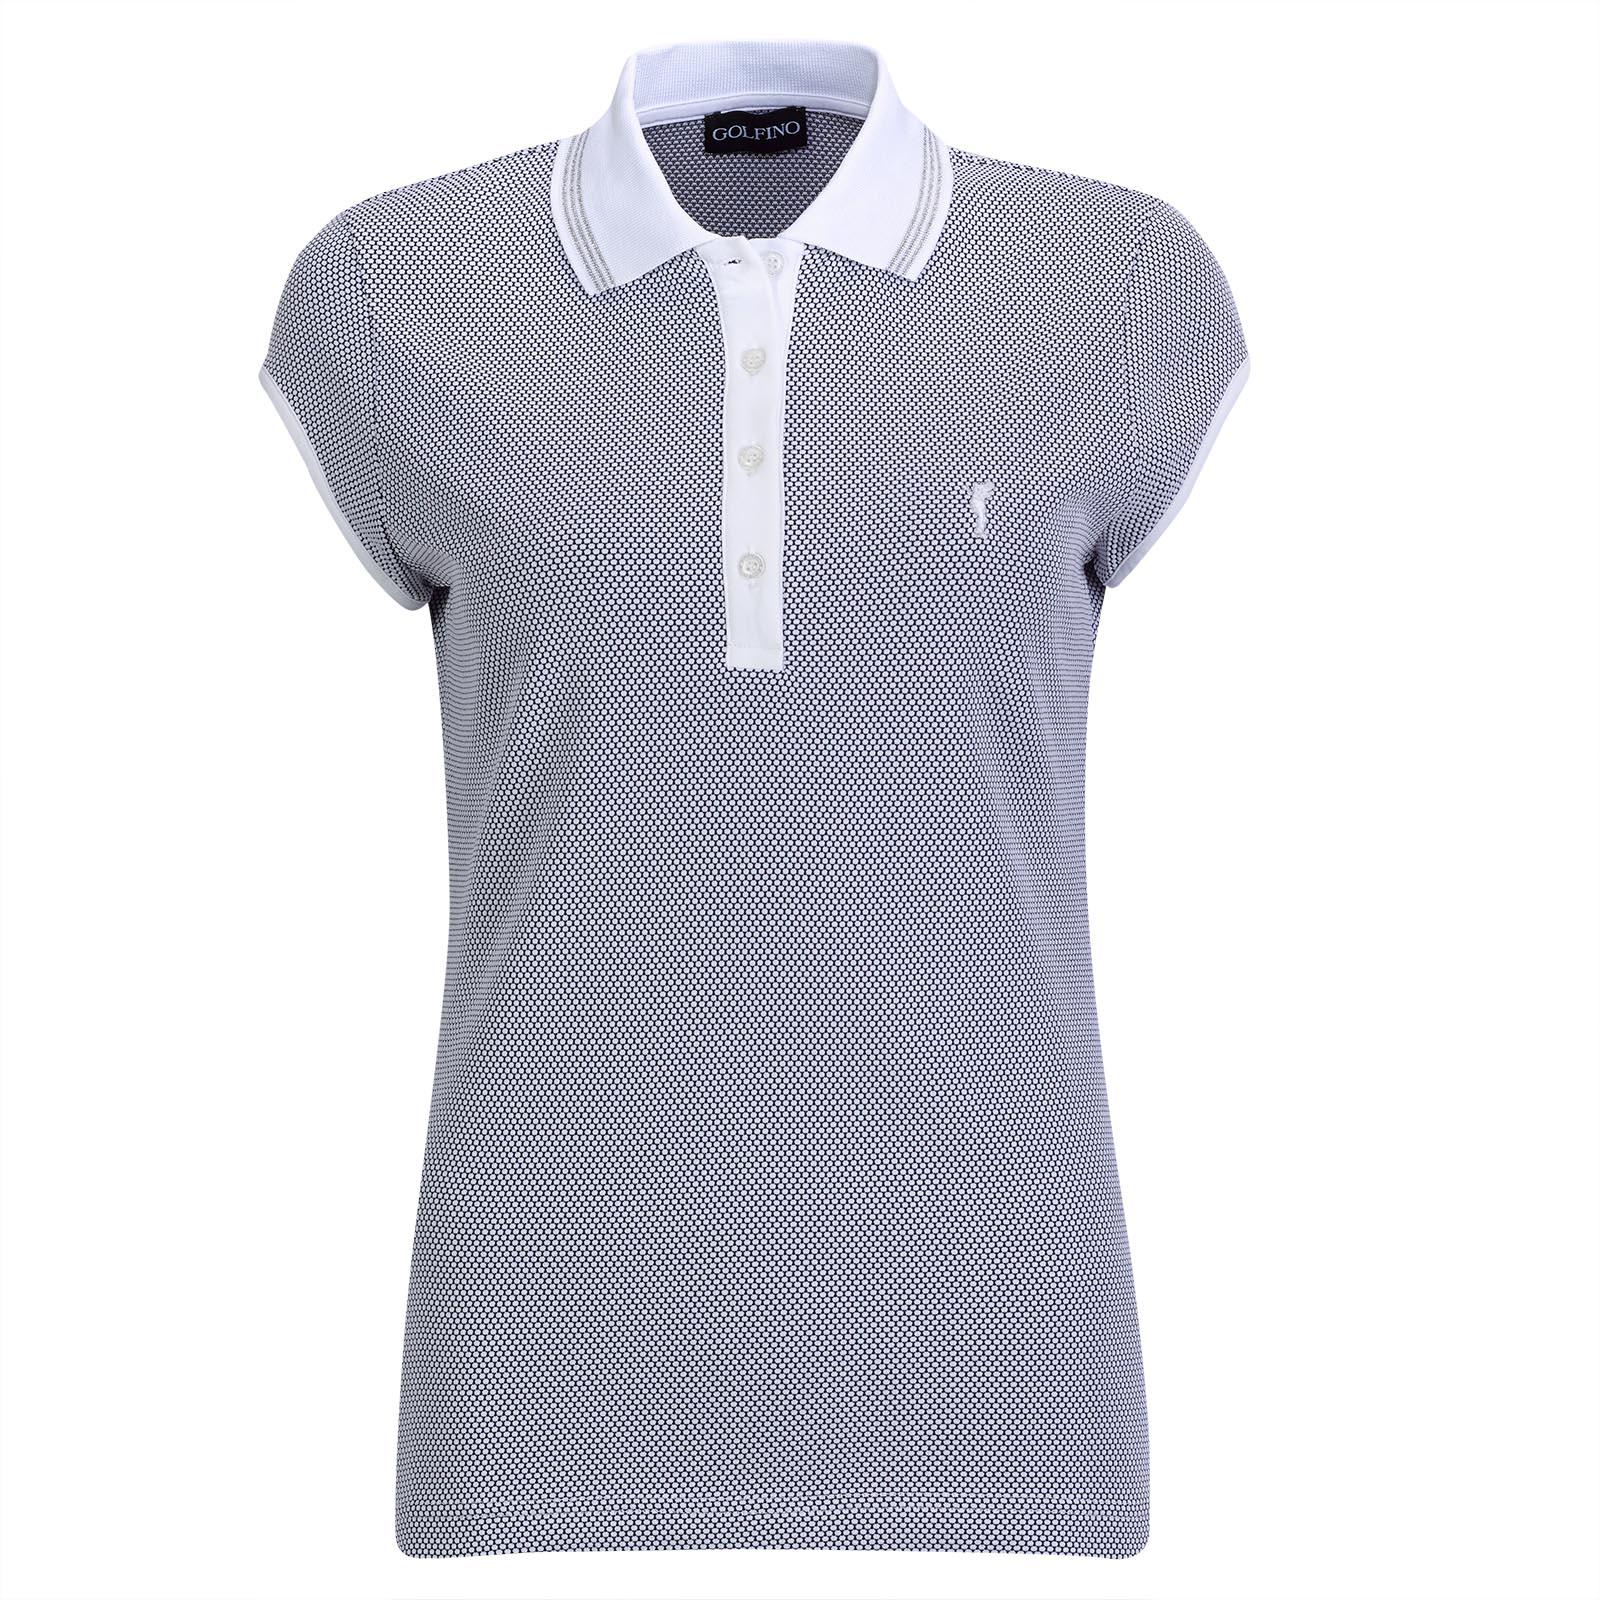 Beliebtes Damen Golfpolo mit Flügelärmeln aus hochwertigem Bubble Jaquard